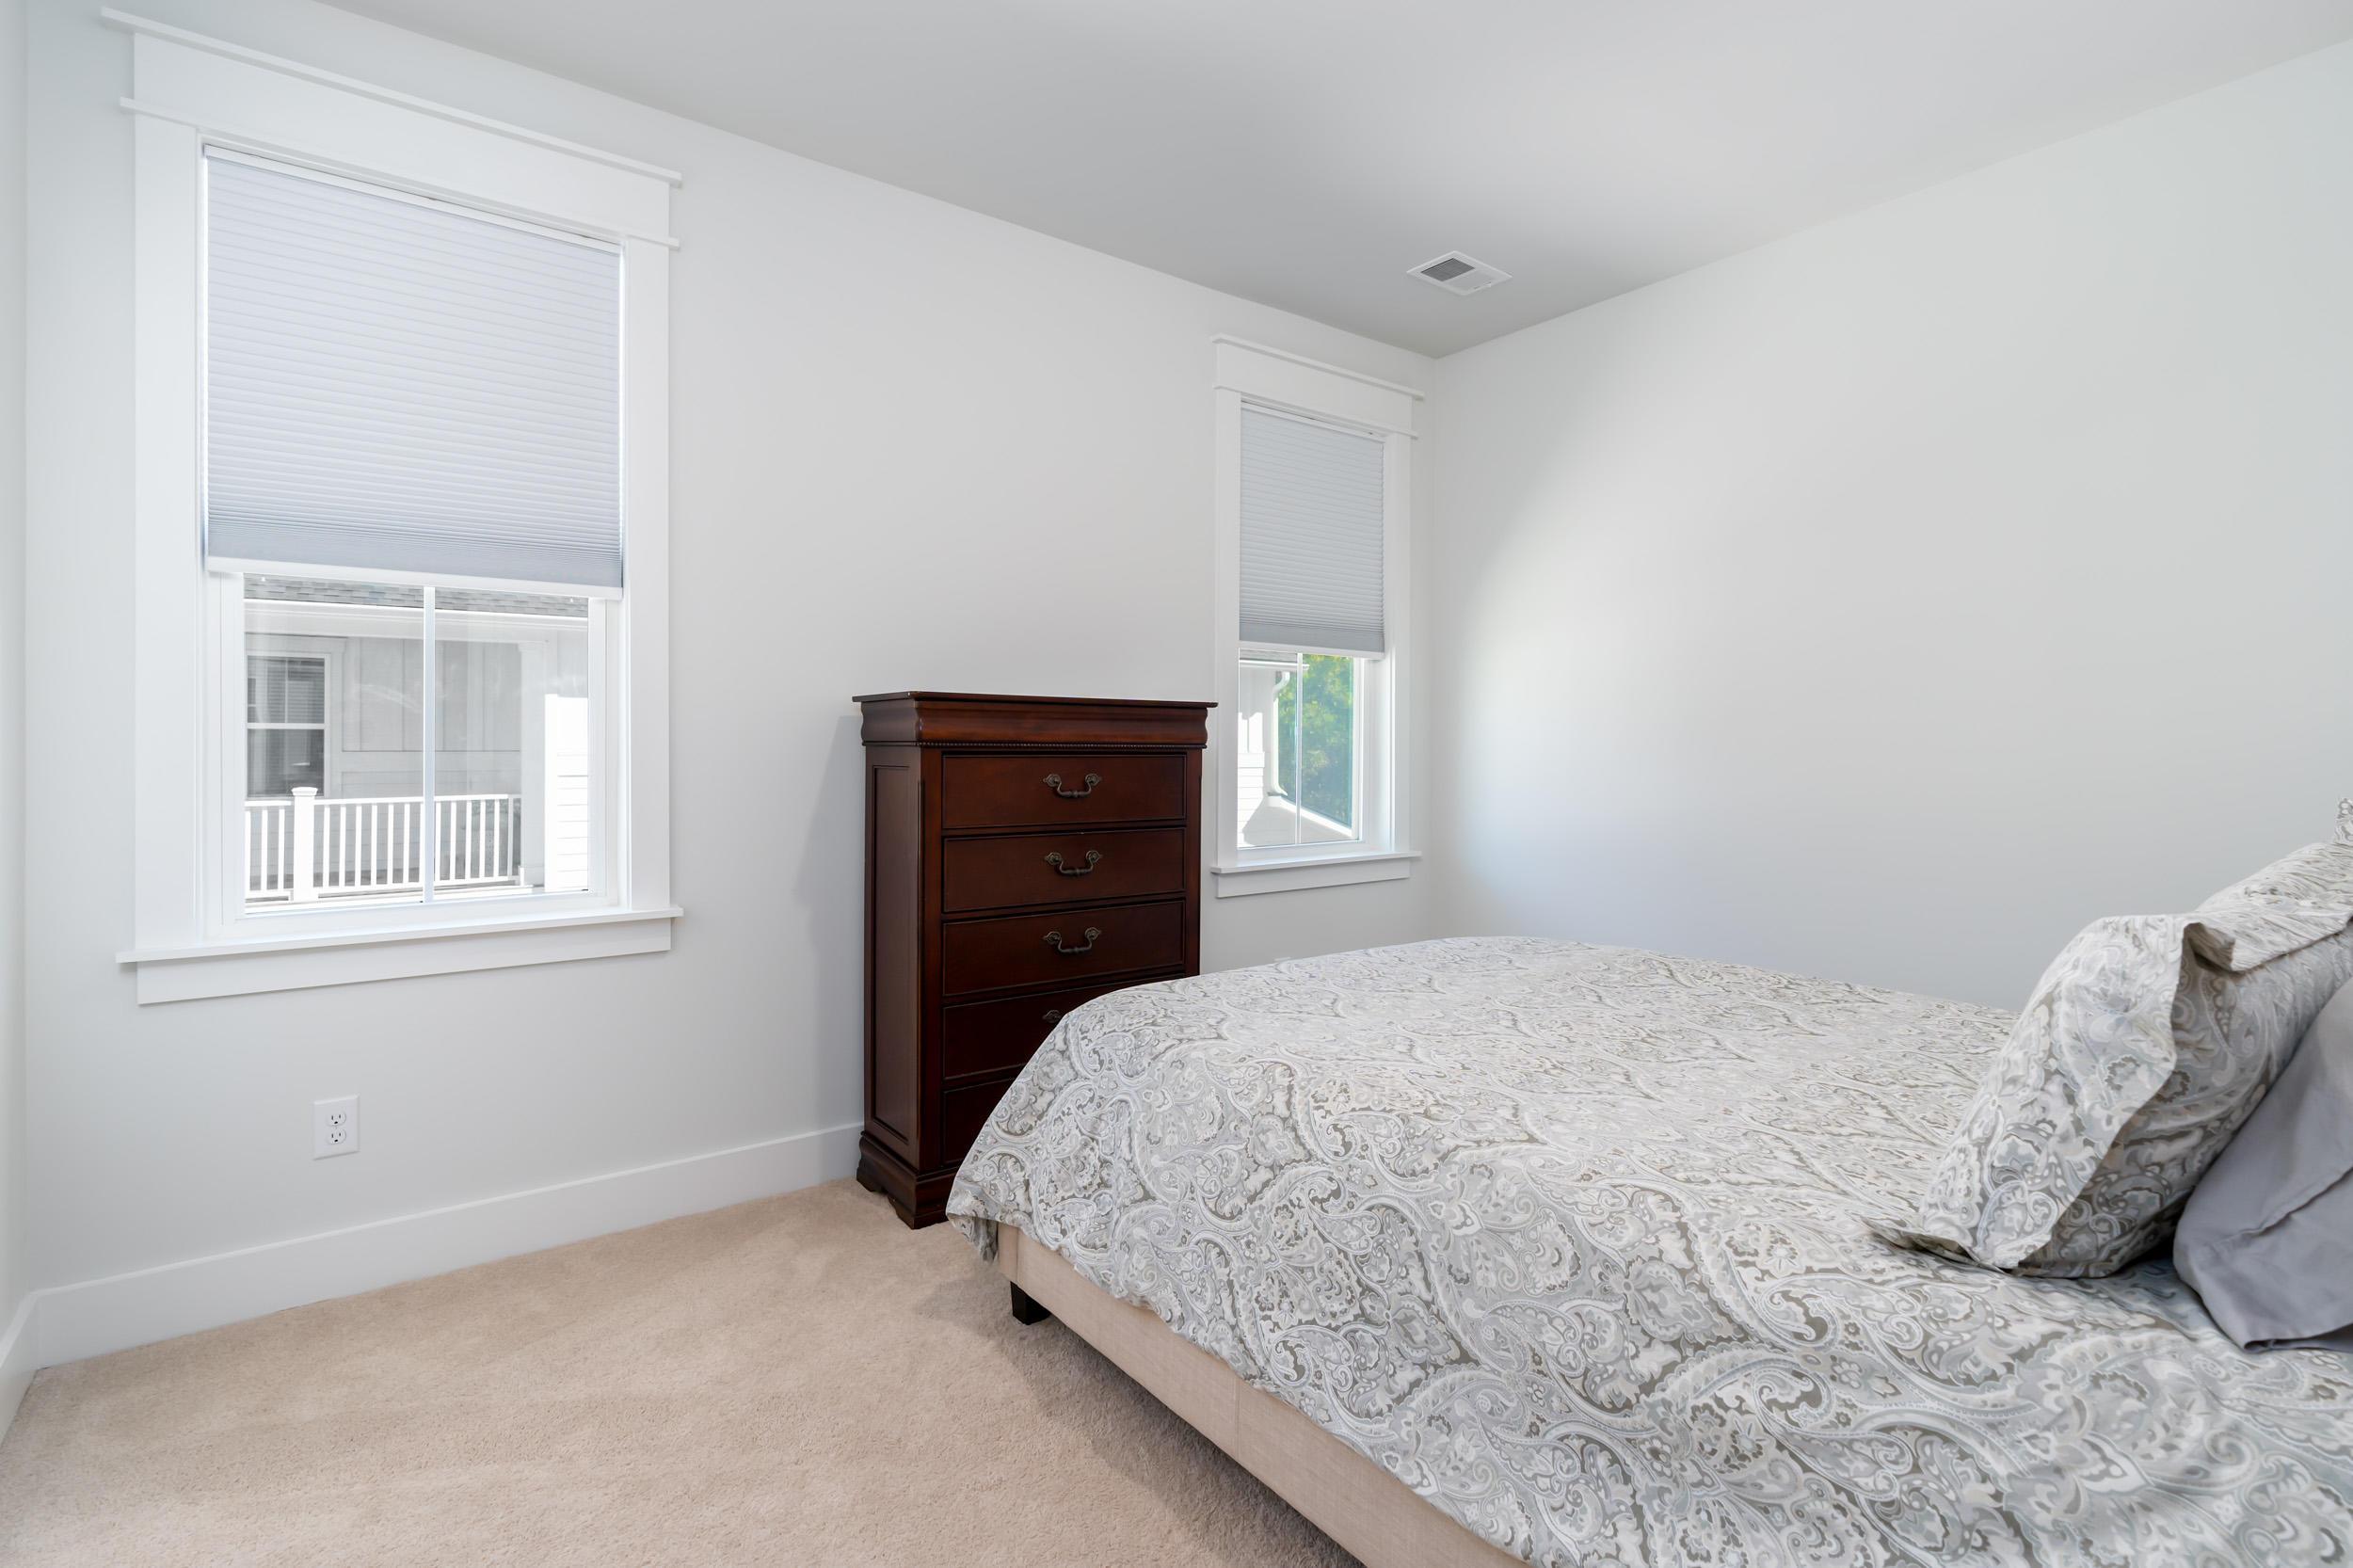 Hamlin Oaks Homes For Sale - 2921 Tranquility, Mount Pleasant, SC - 24